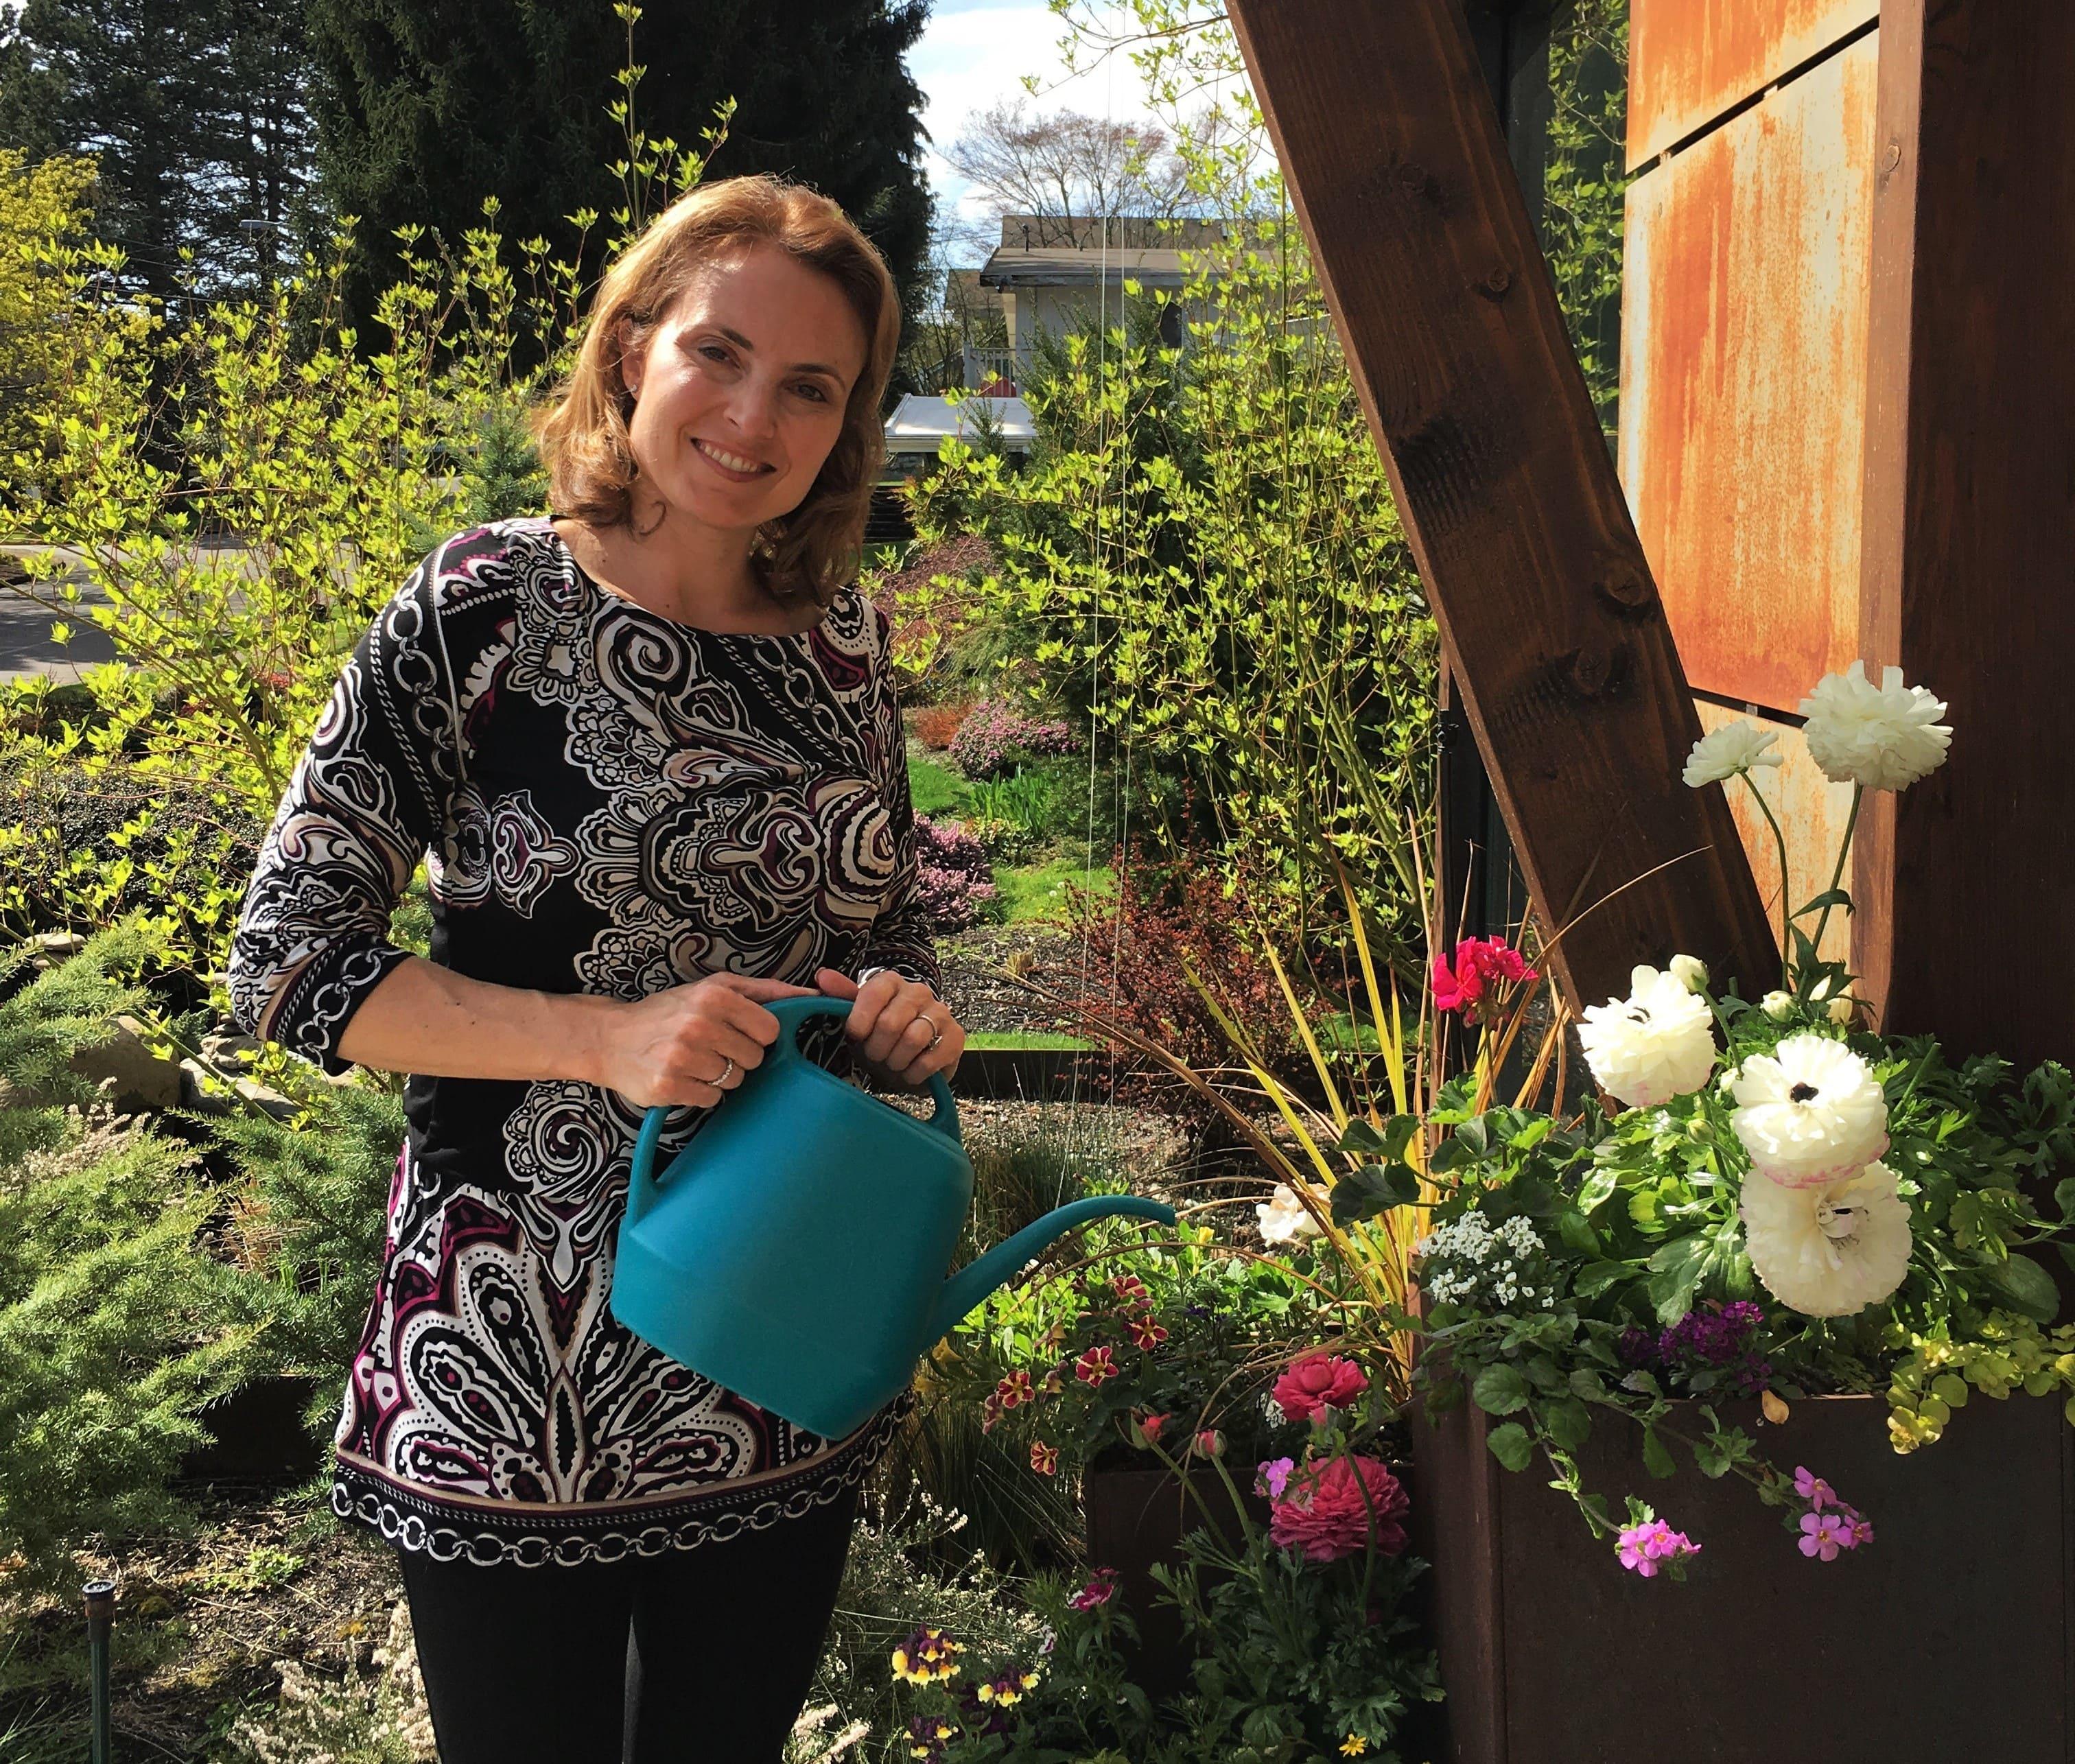 Sheri Gardening